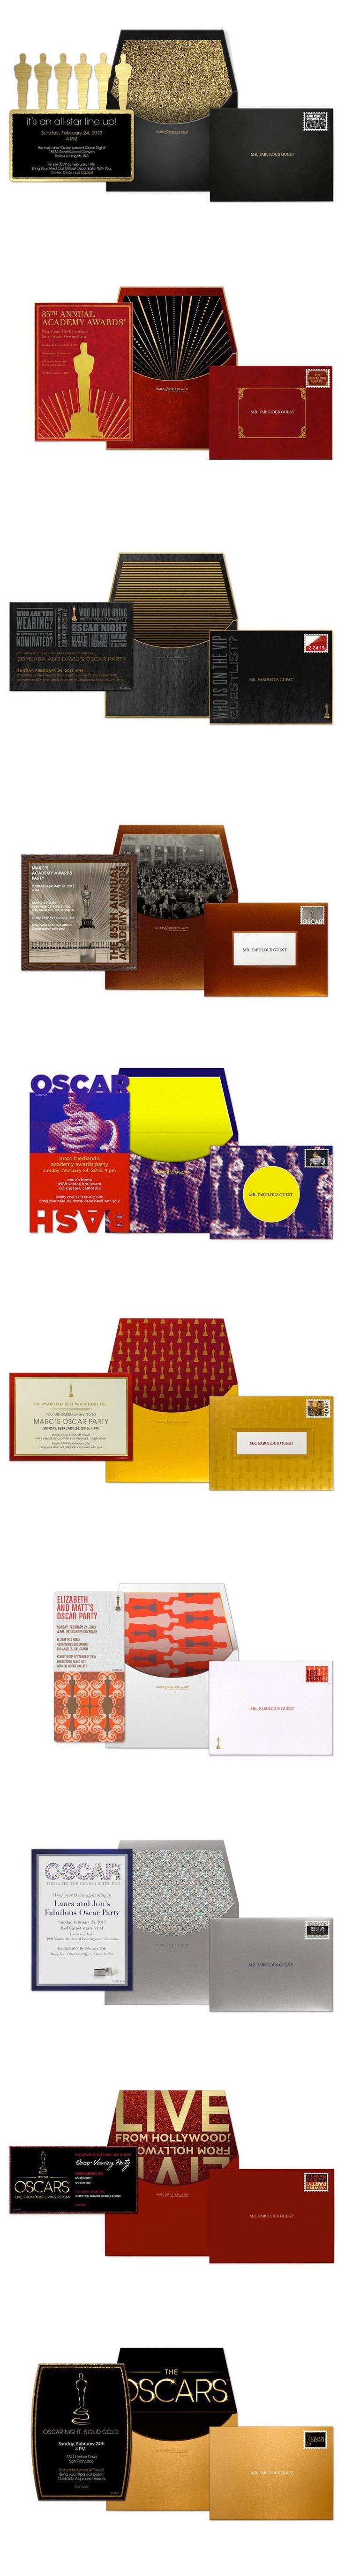 "Oscar Party Invites    ""Will the Oscar Envelopes Ever Go Digital? Designer Tells All"""